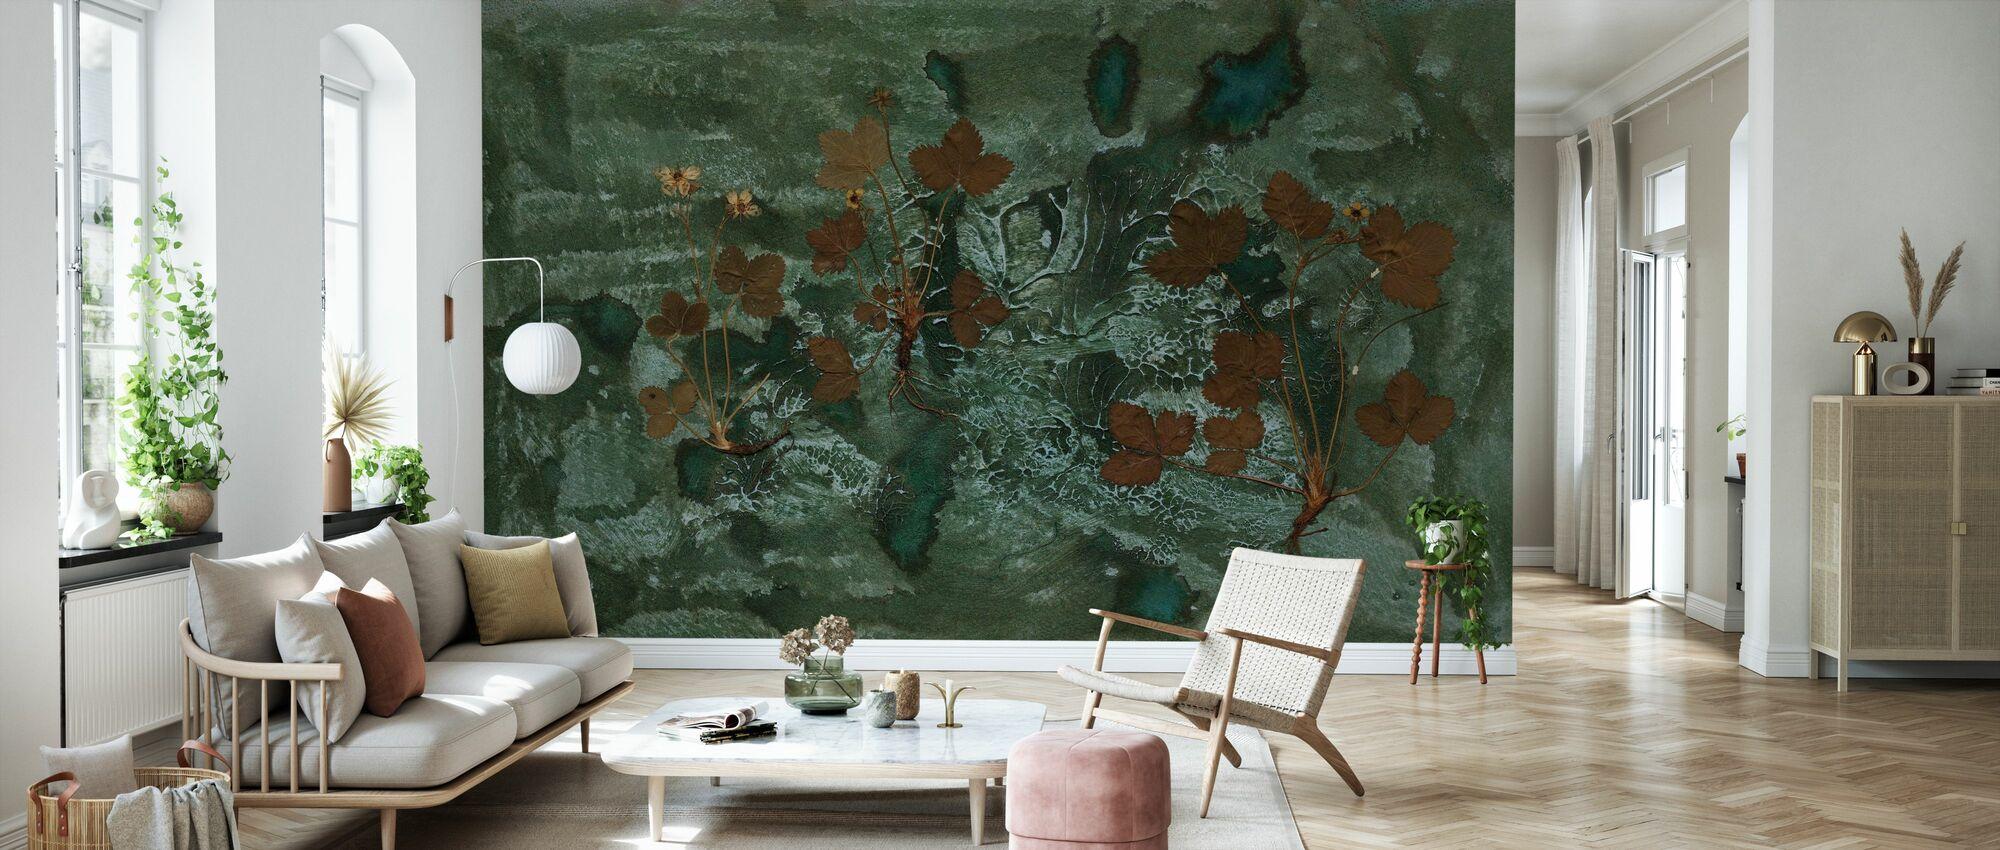 Bibi - Wallpaper - Living Room